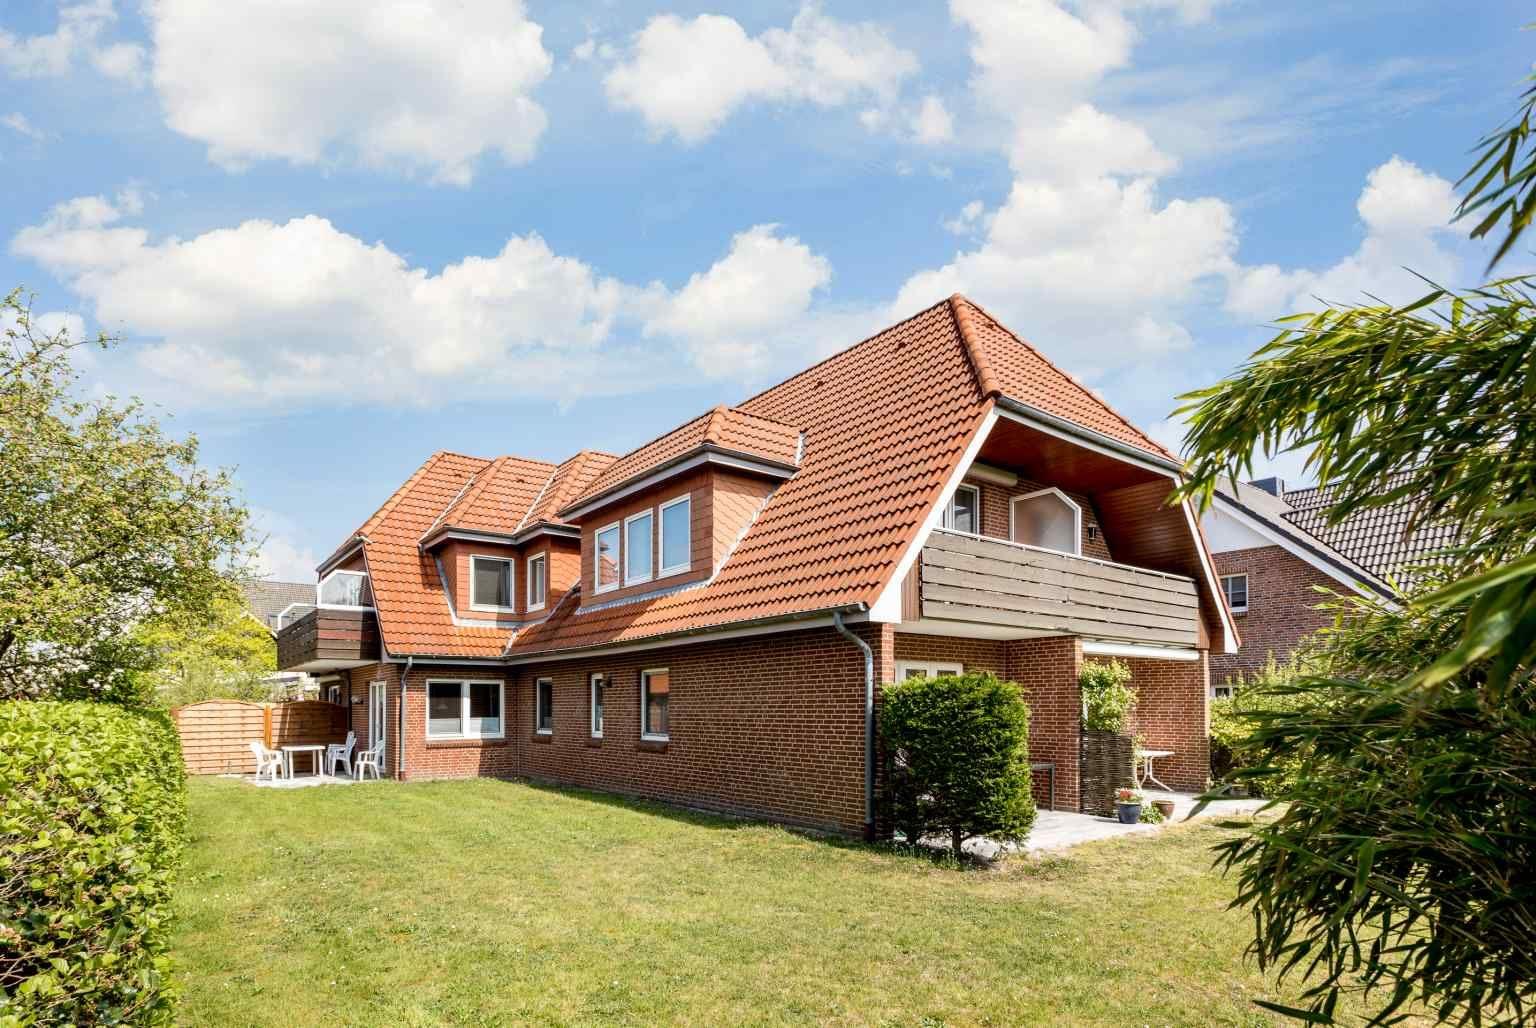 "Rückwärtige Ansicht - St Peter Ording Dorf, Haus Duenenblick, Wohnung 1 ""Sonnenblick"""